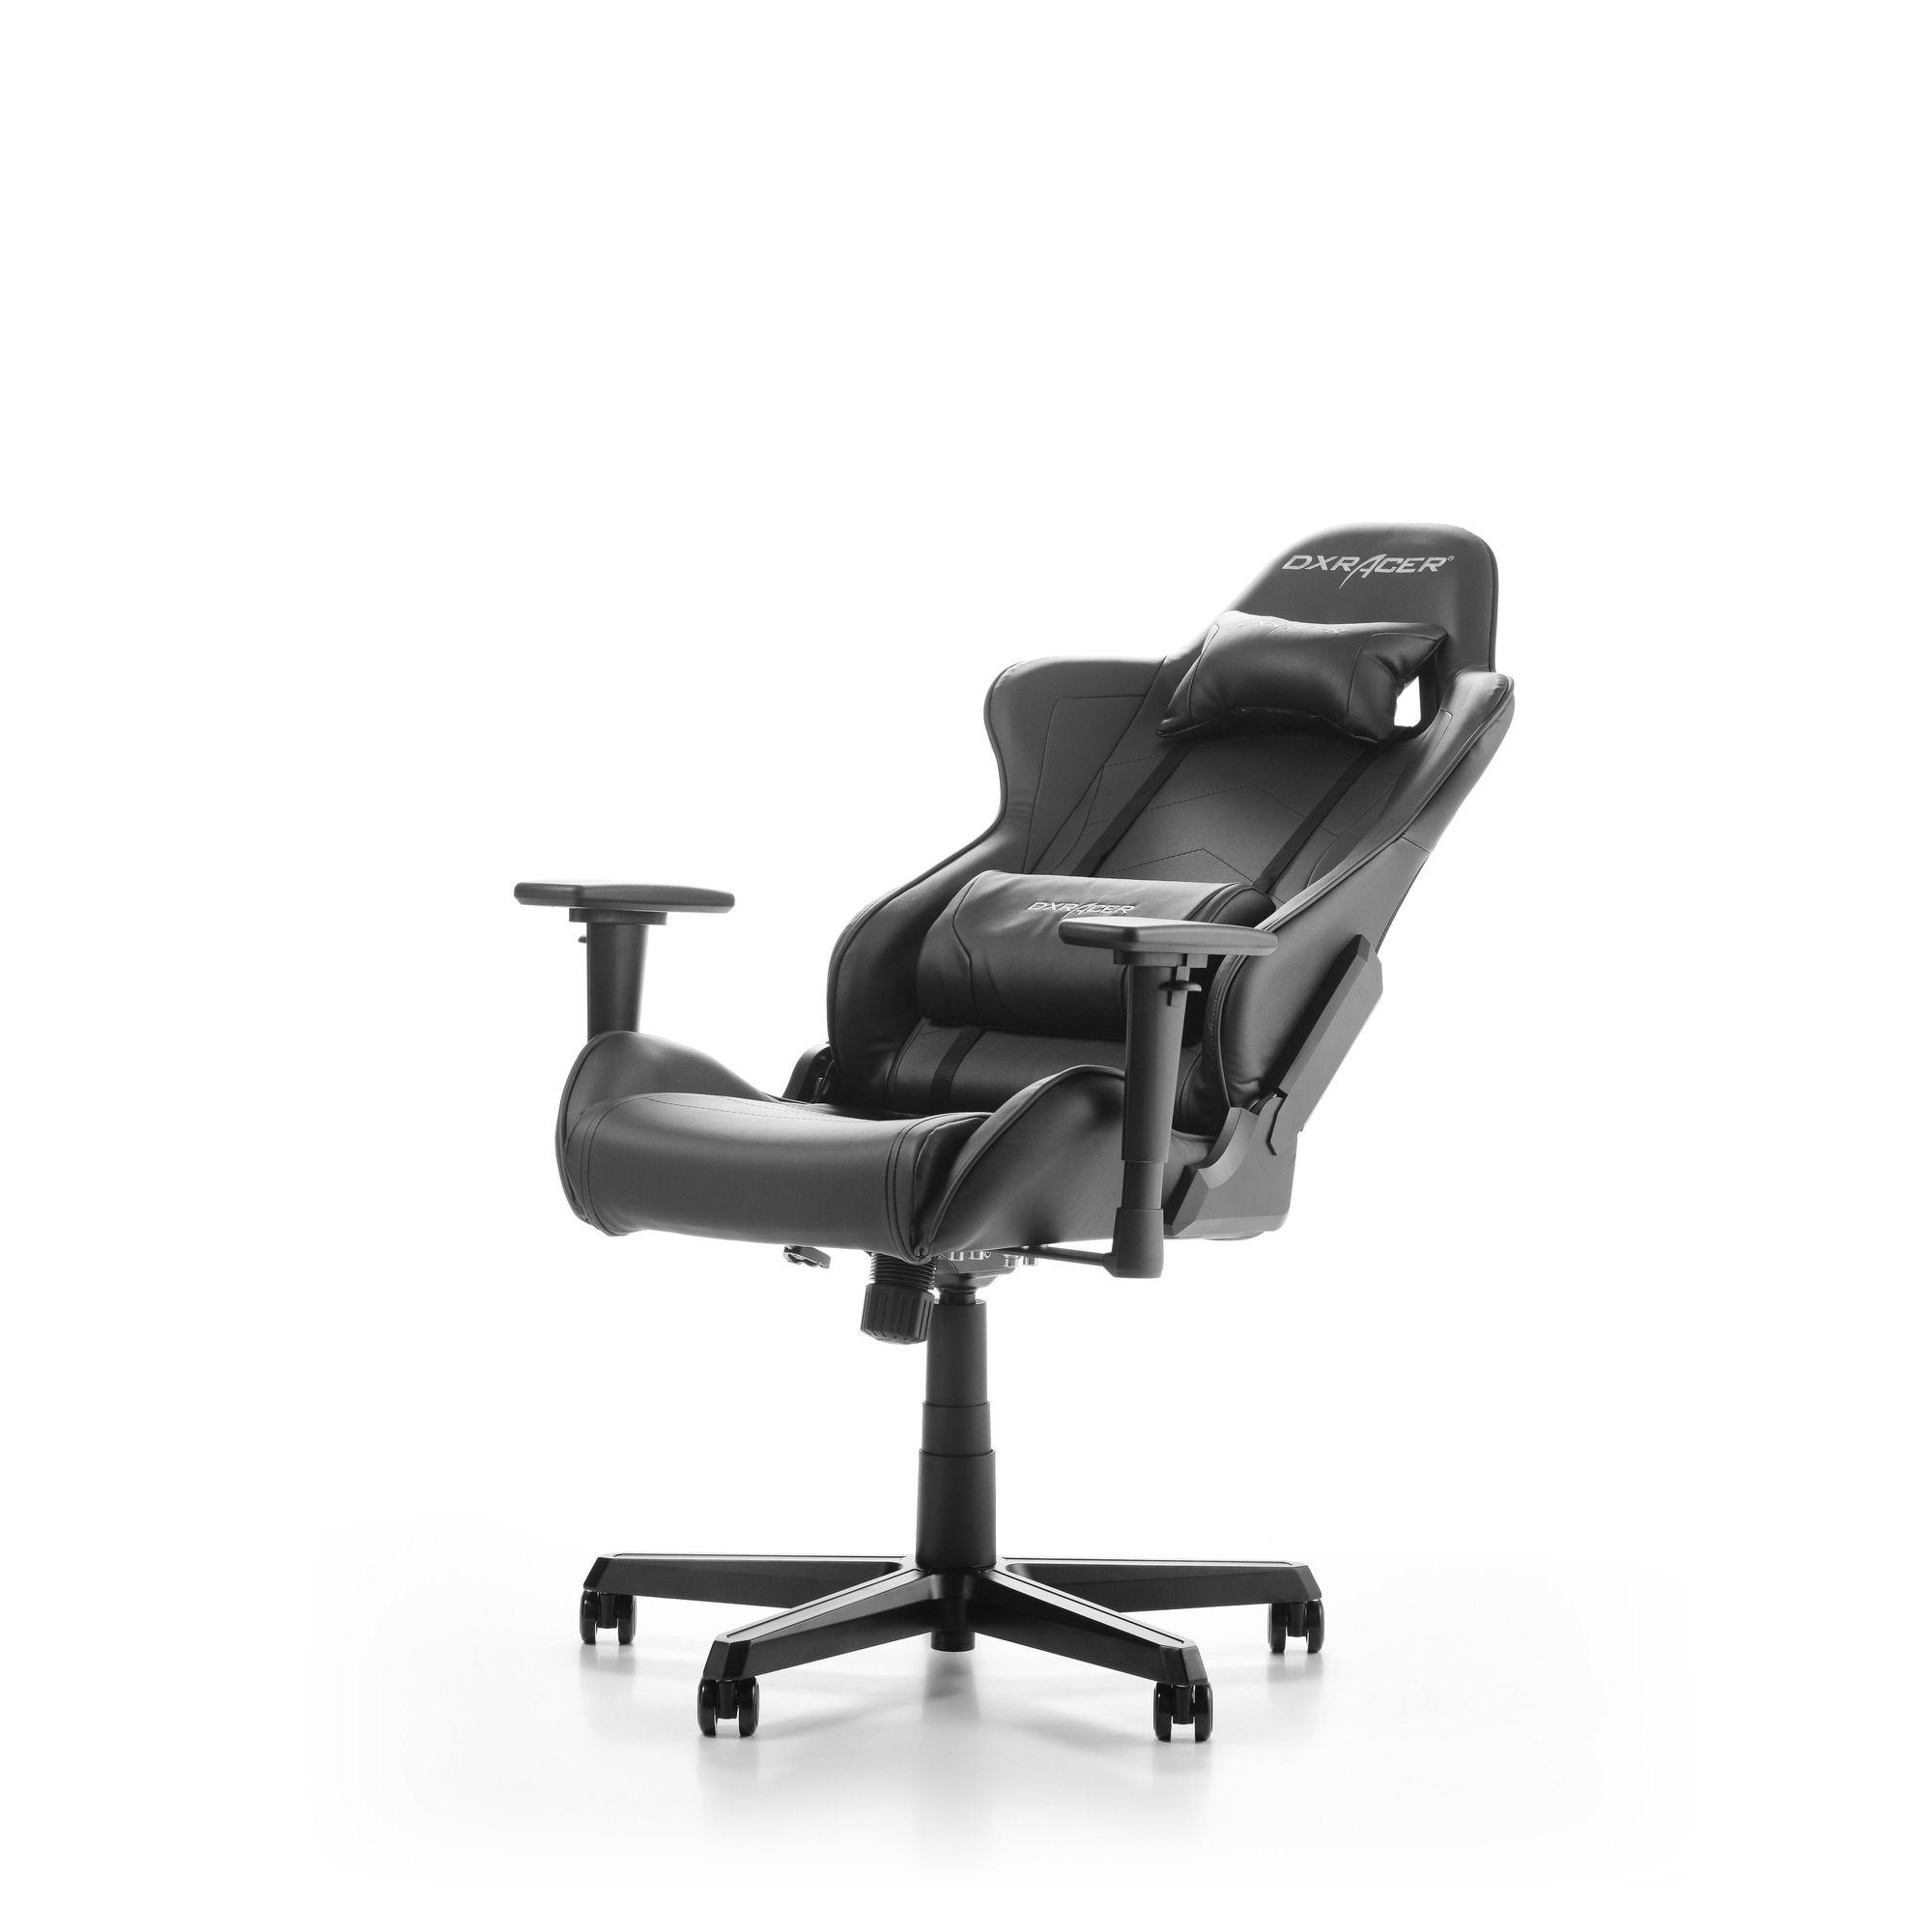 Гейминг стол DXRacer OH/FH08/N - серия FORMULA, черен - 4